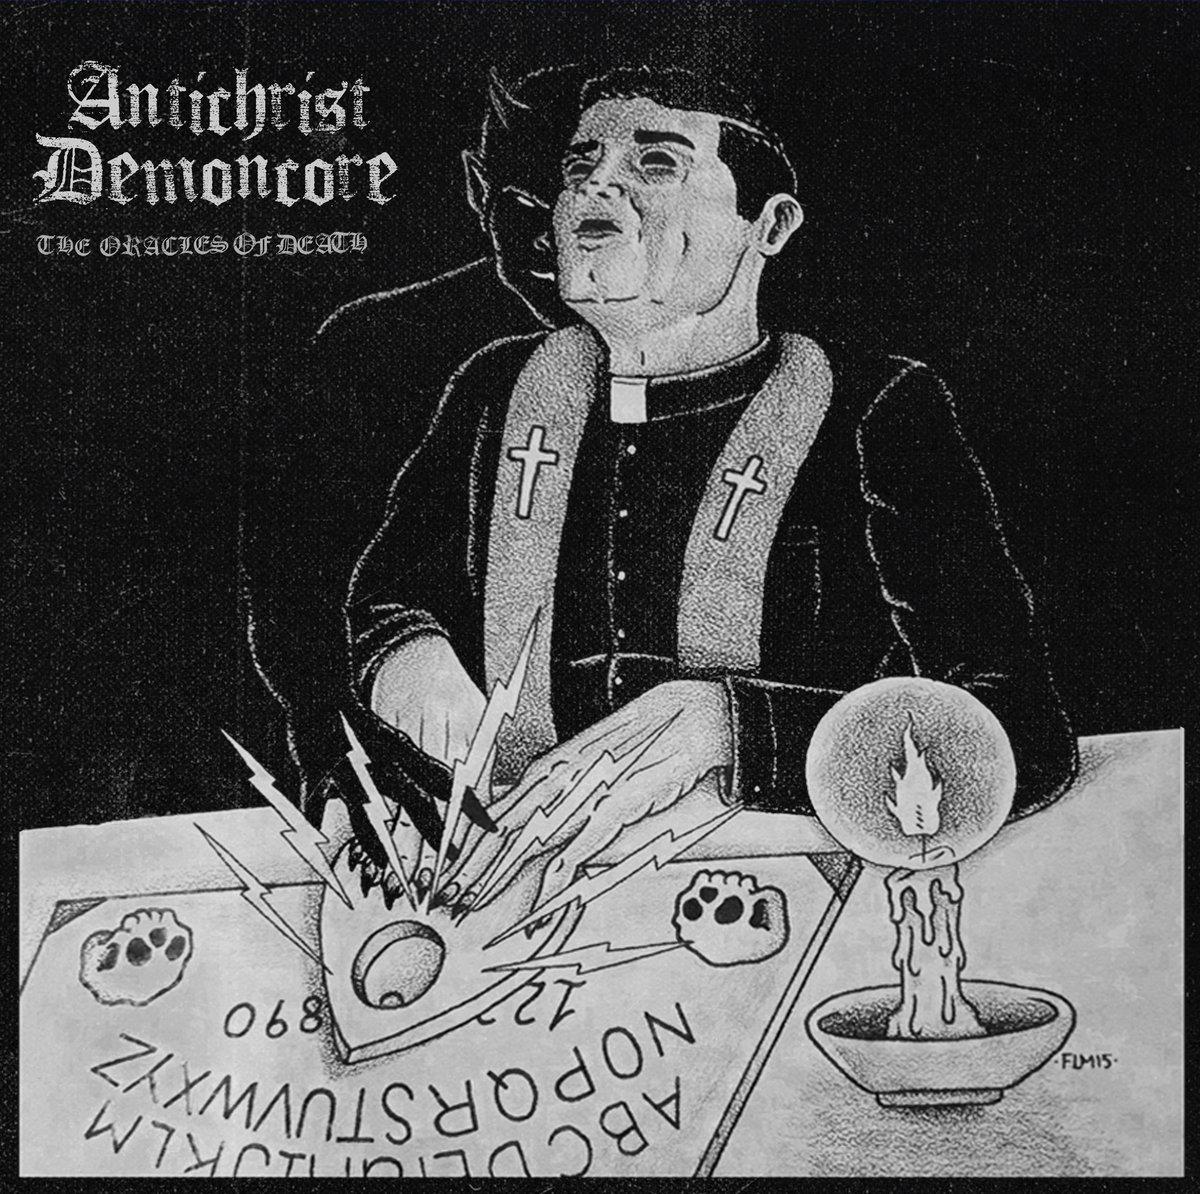 Antichrist Demoncore - The Oracles of Death LP